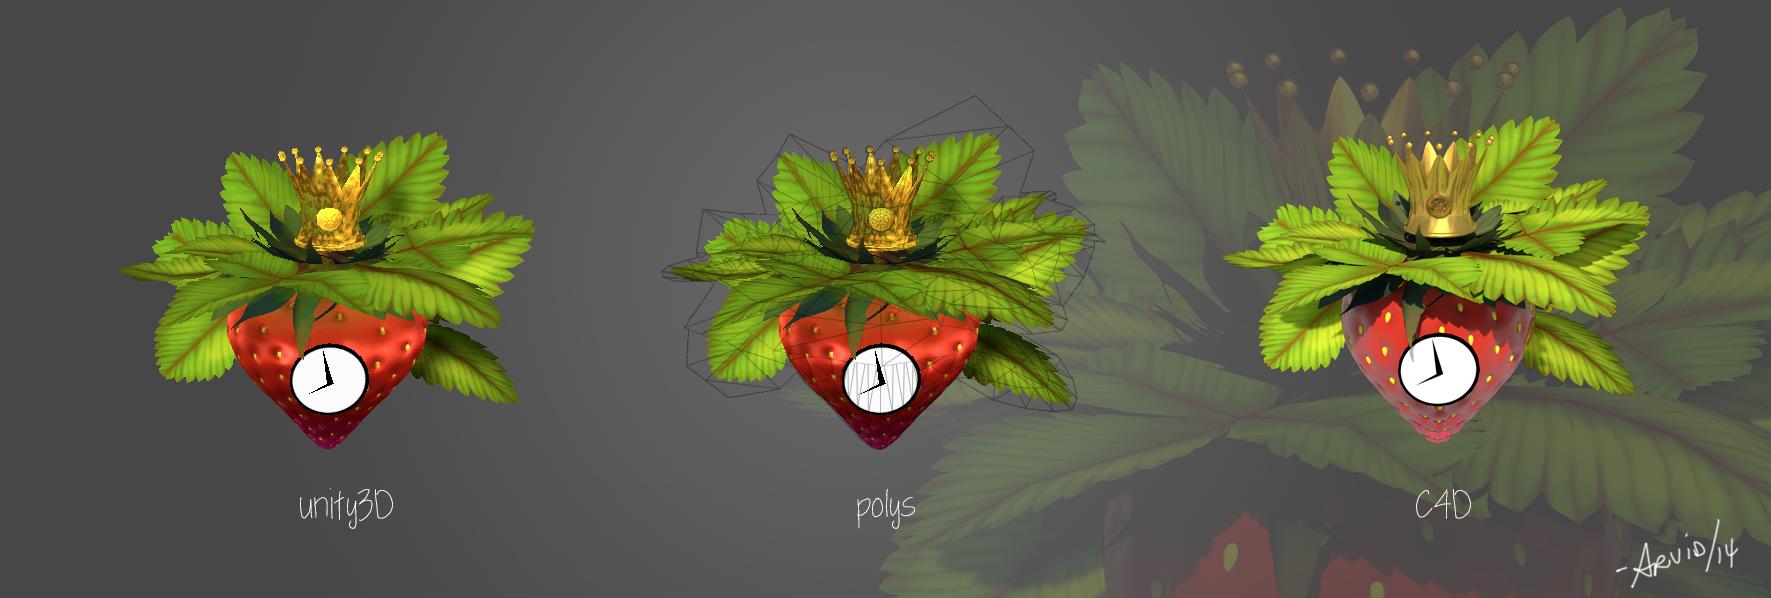 1418507_141529127812_strawberrymaster.jpg